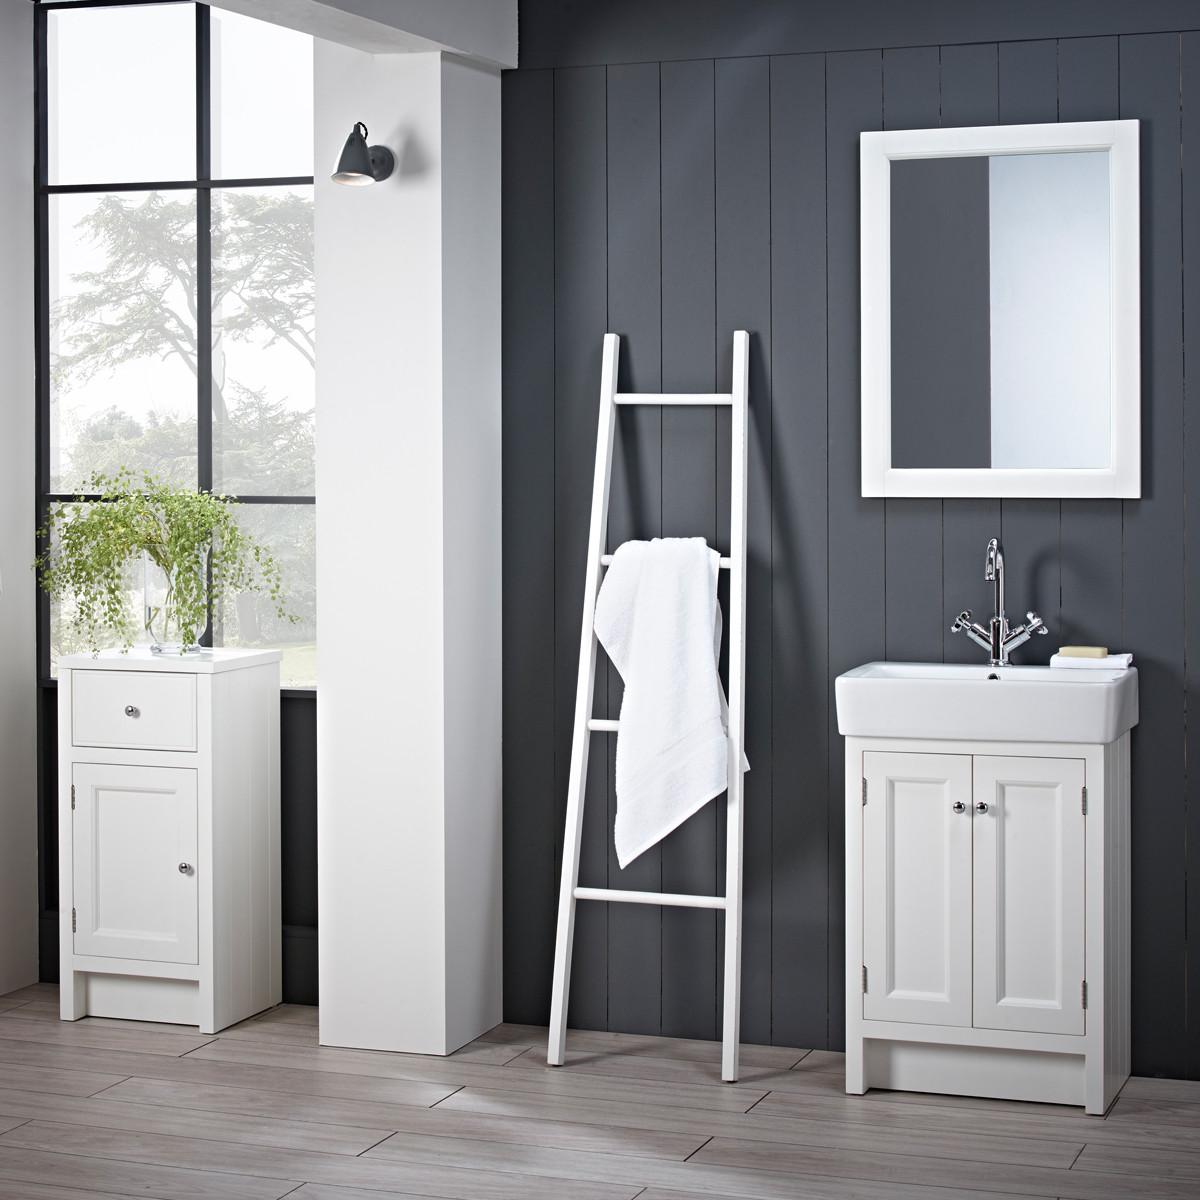 roper rhodes hampton chalk white 550mm countertop vanity unit with basin ham550b w ham560c. Black Bedroom Furniture Sets. Home Design Ideas